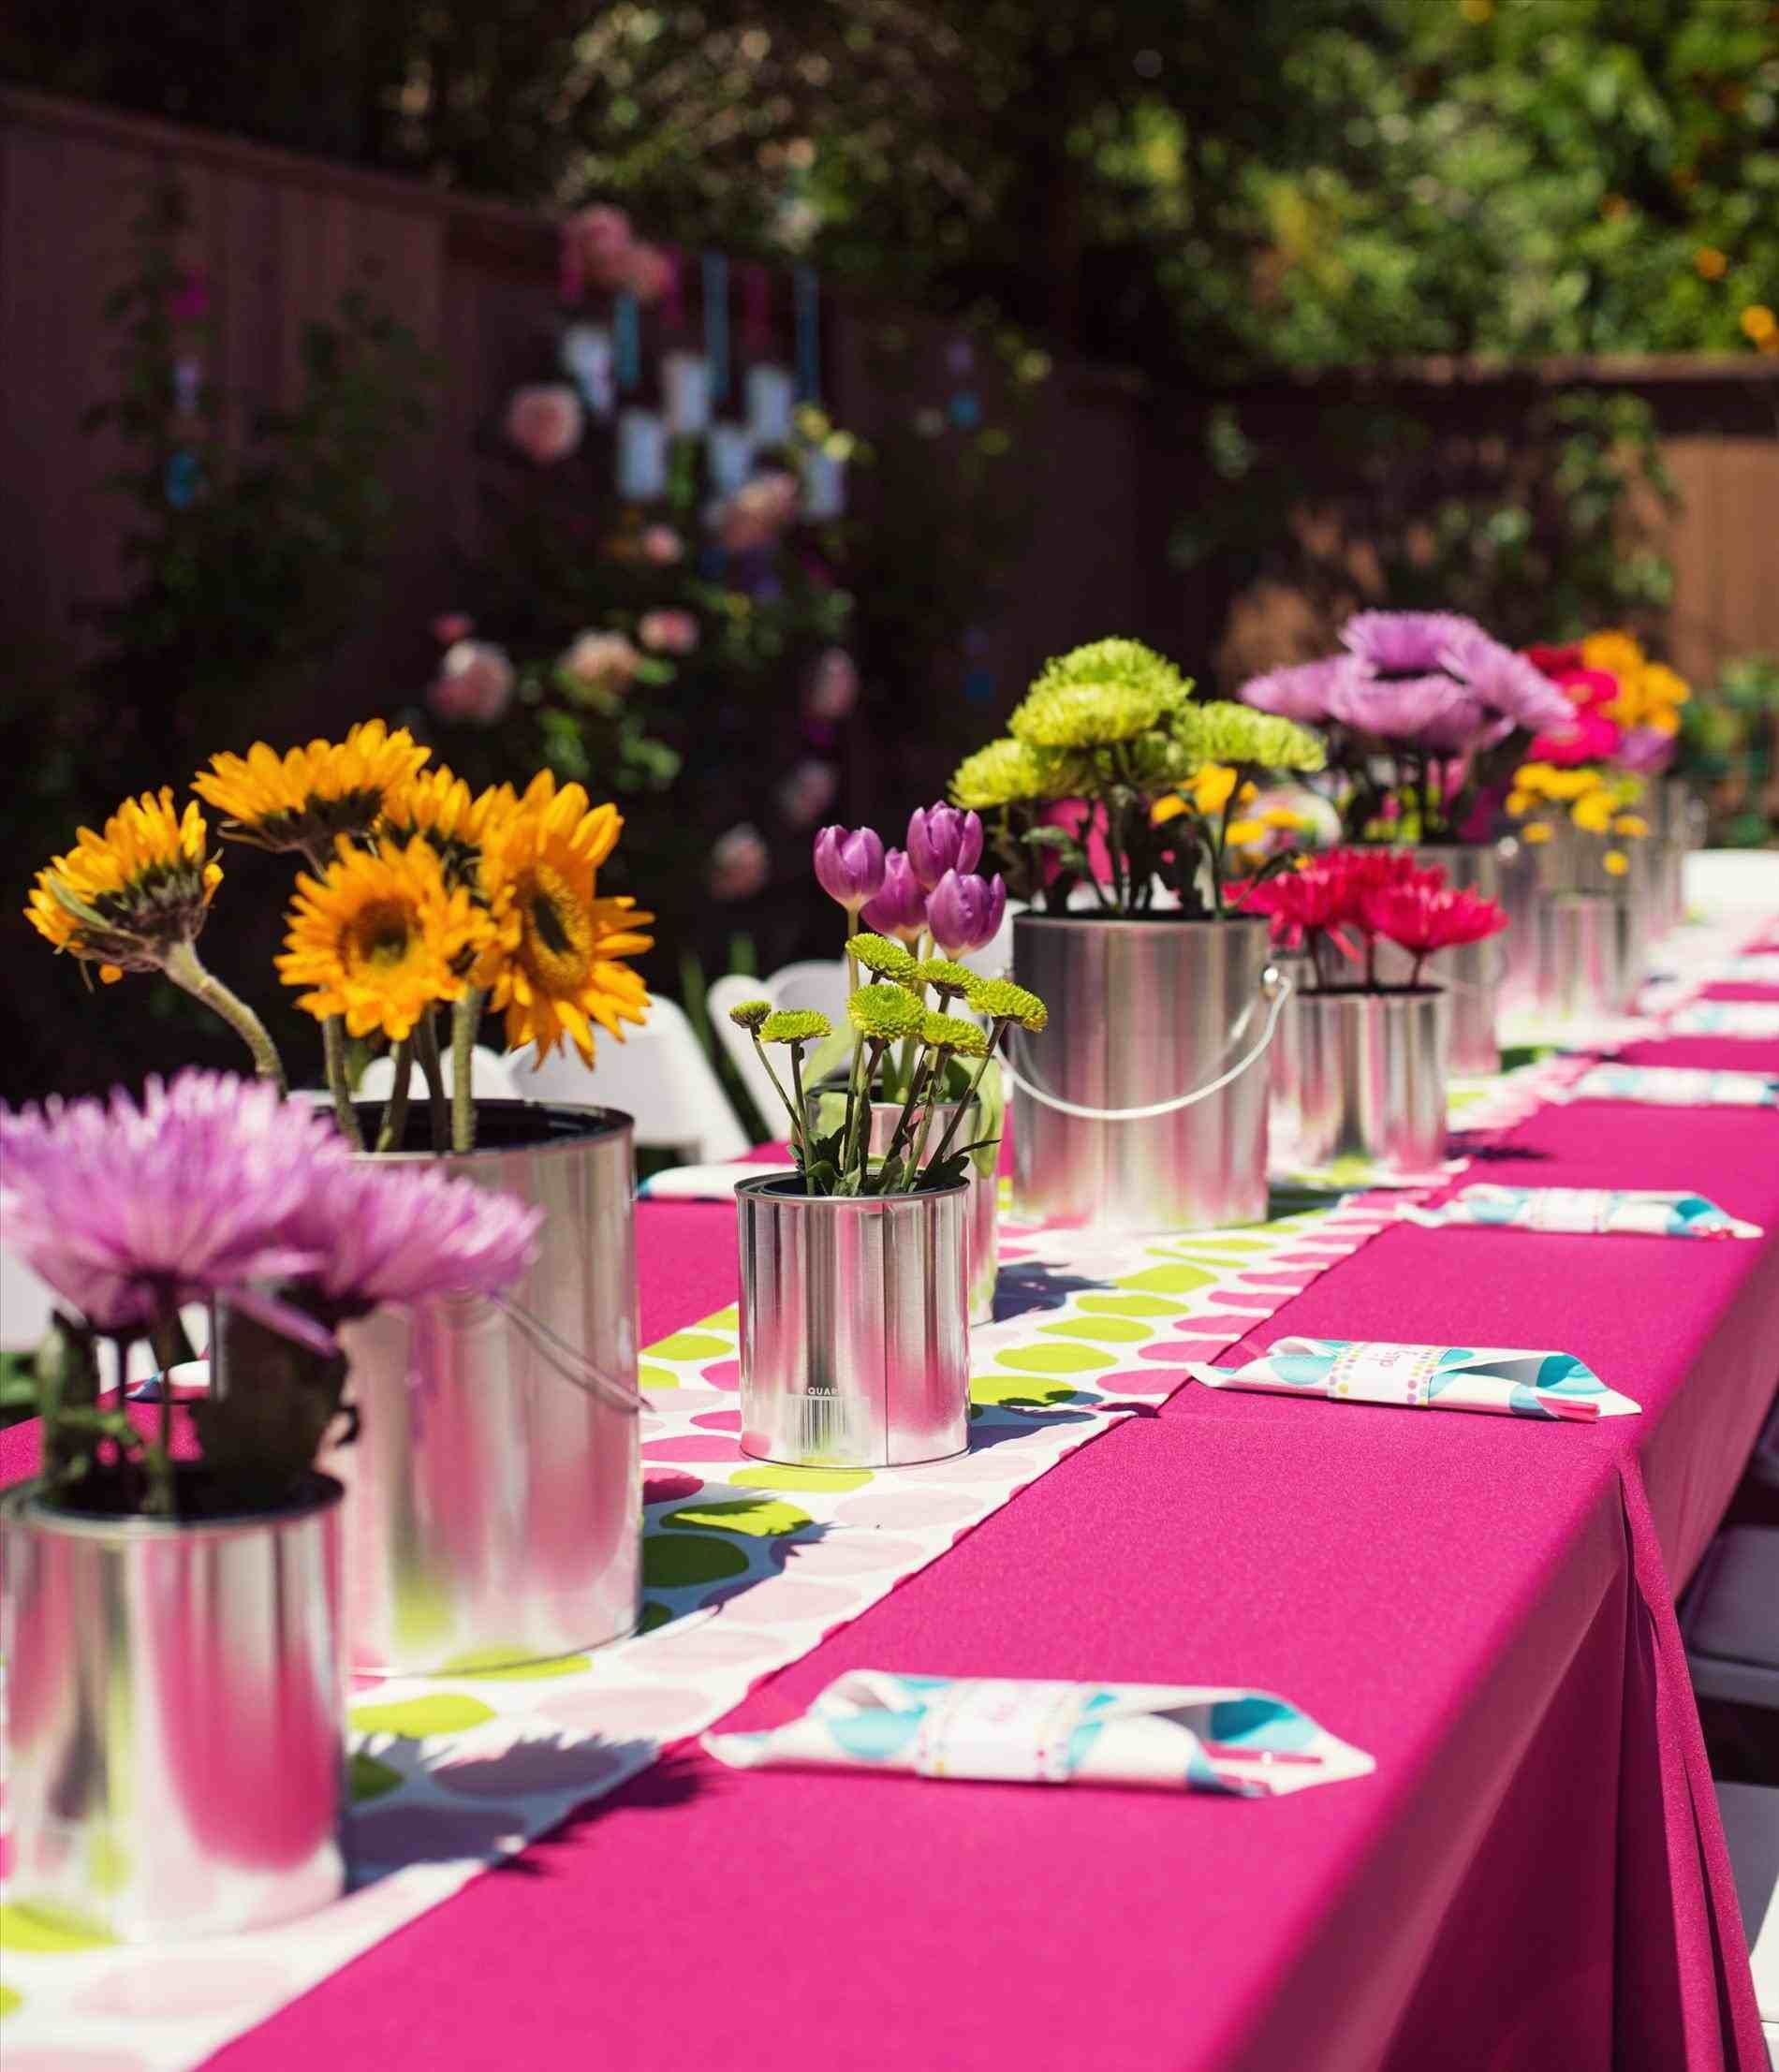 Flower garden party decorations home ideas pinterest decoration new post flower garden party decorations visit bobayule trending decors izmirmasajfo